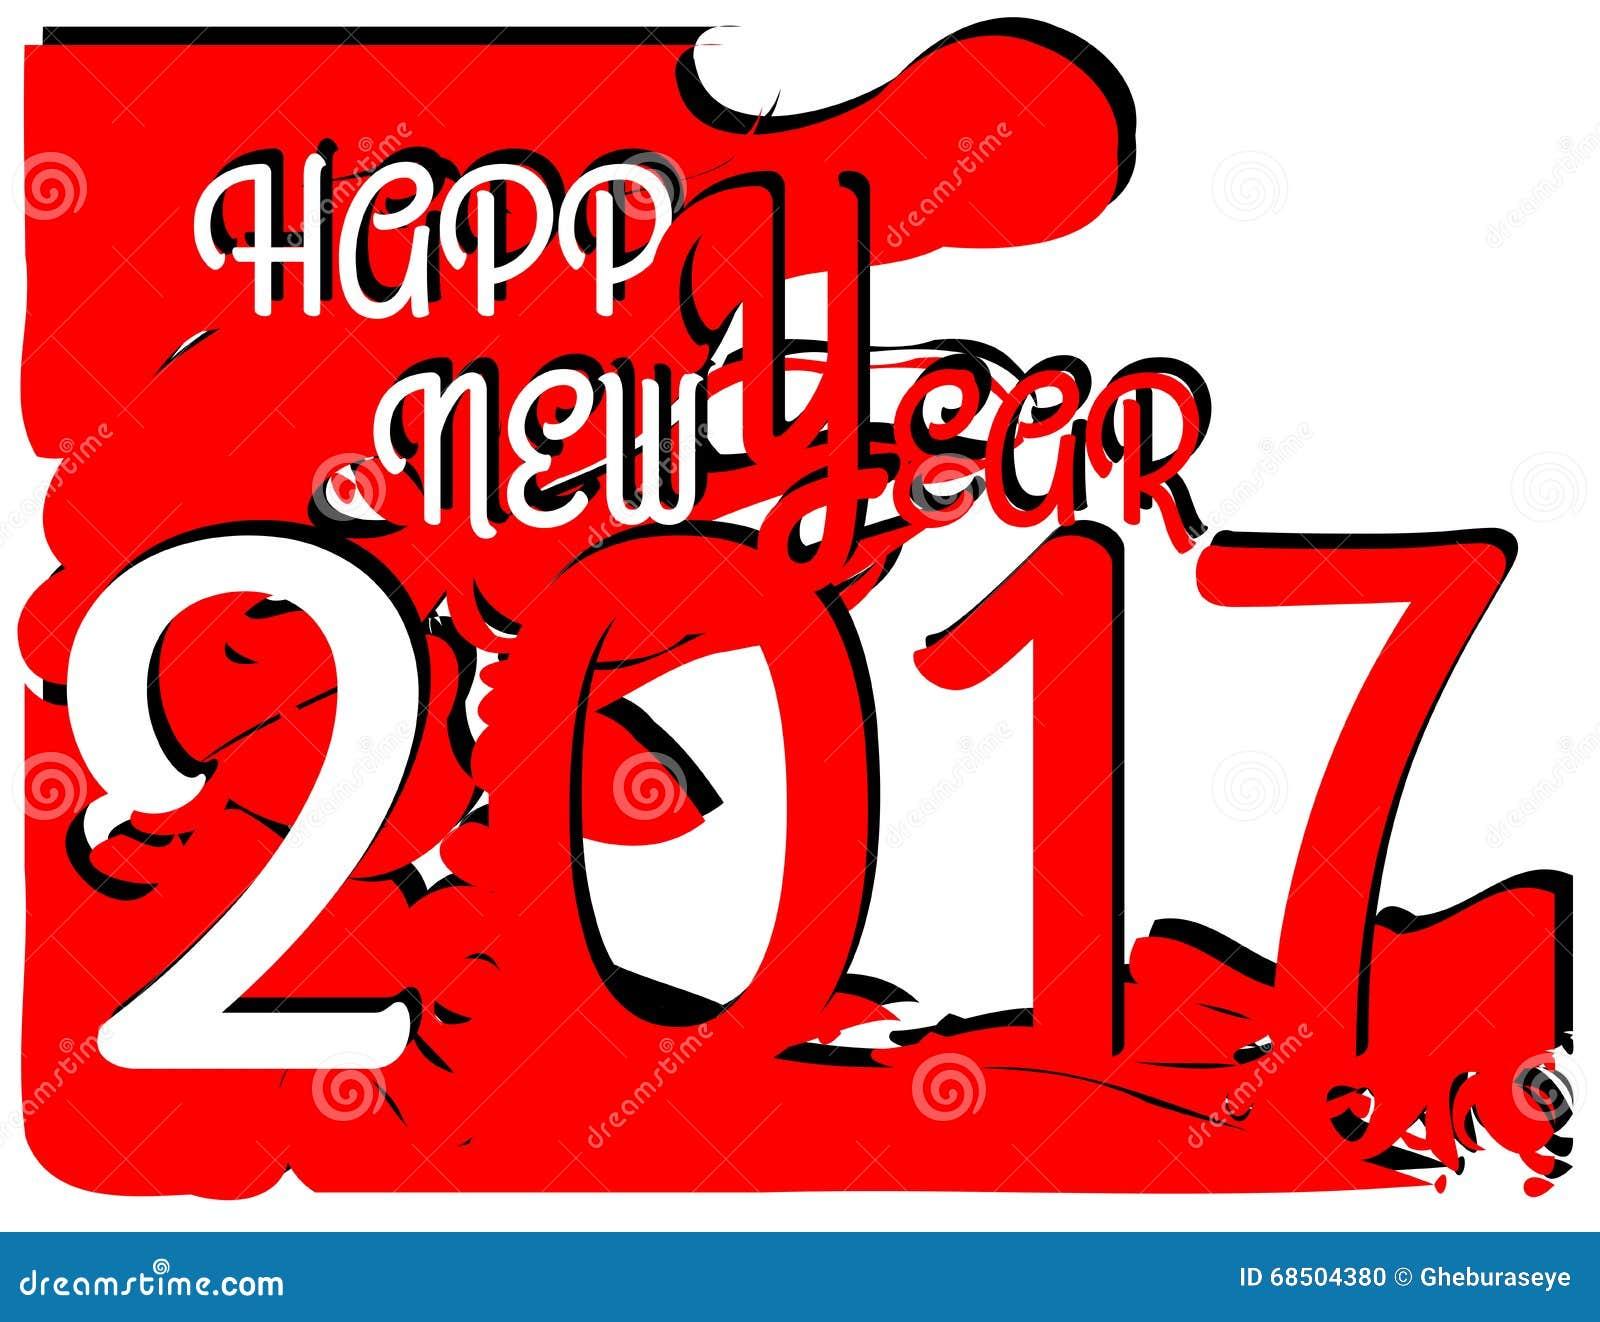 Video's van Happy new year 5.1 audio 2017